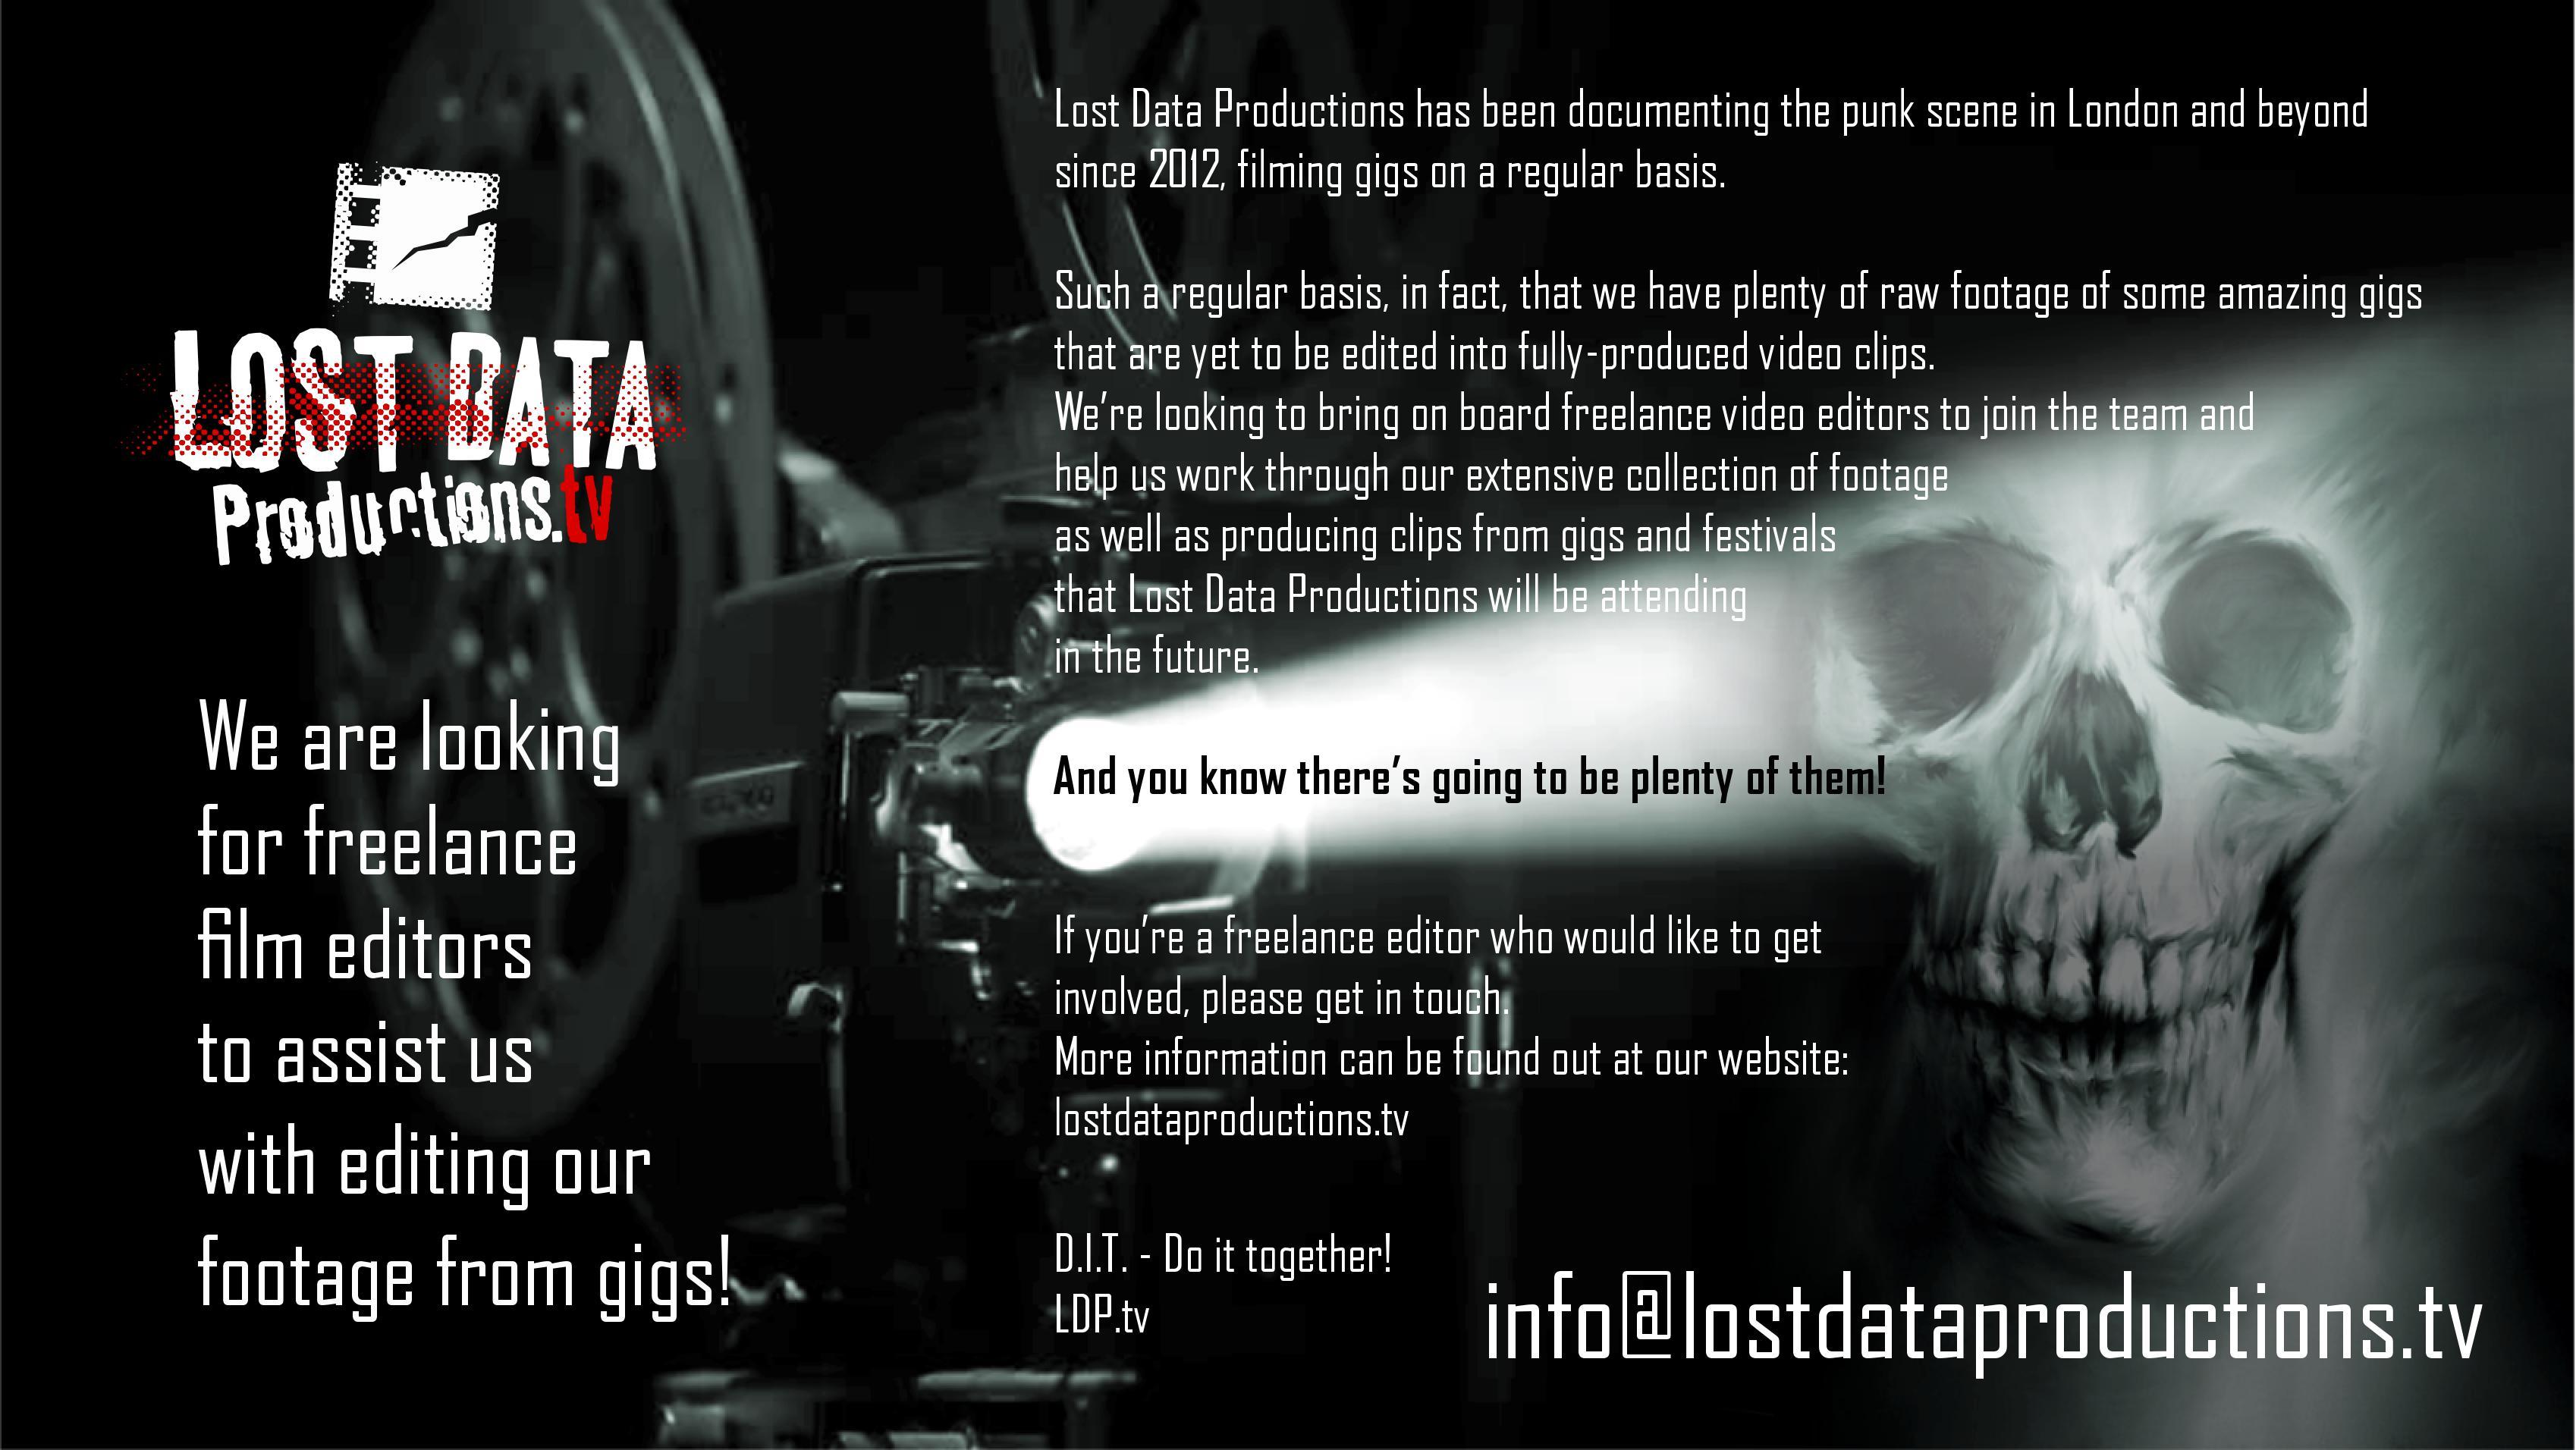 Freelance Film Editors - WE NEED YOU!